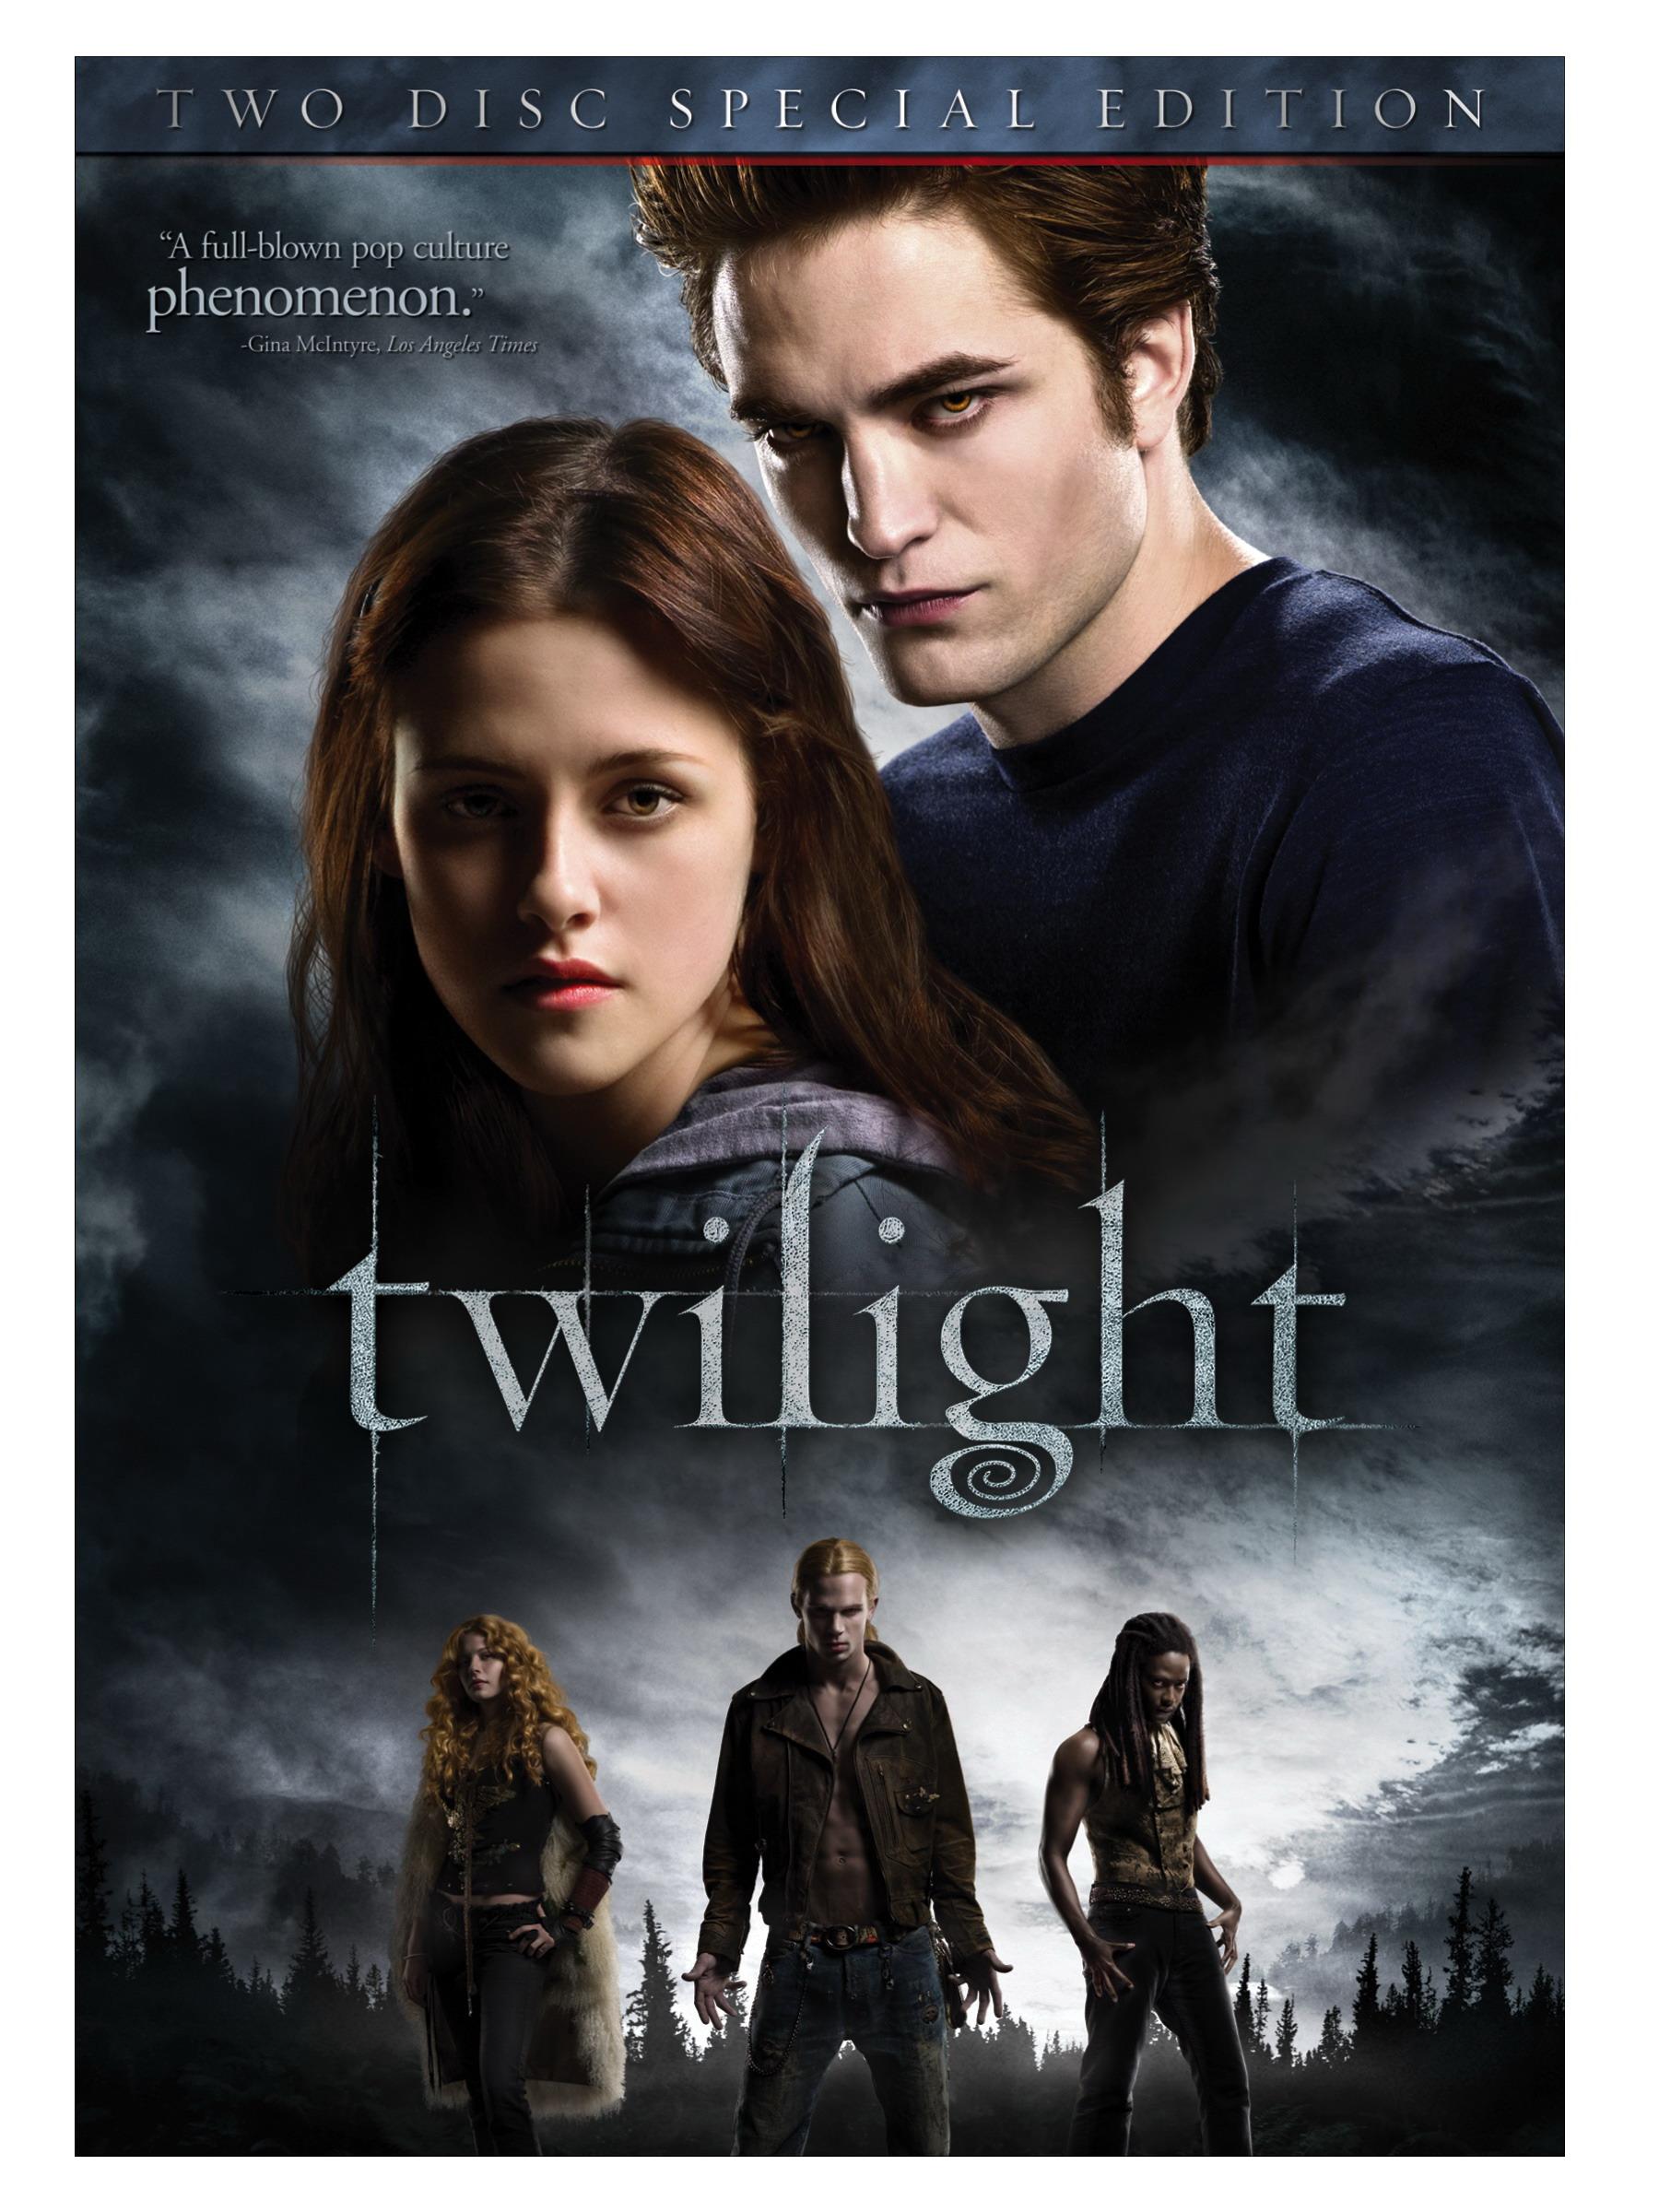 Twilight - 人鬼情难了